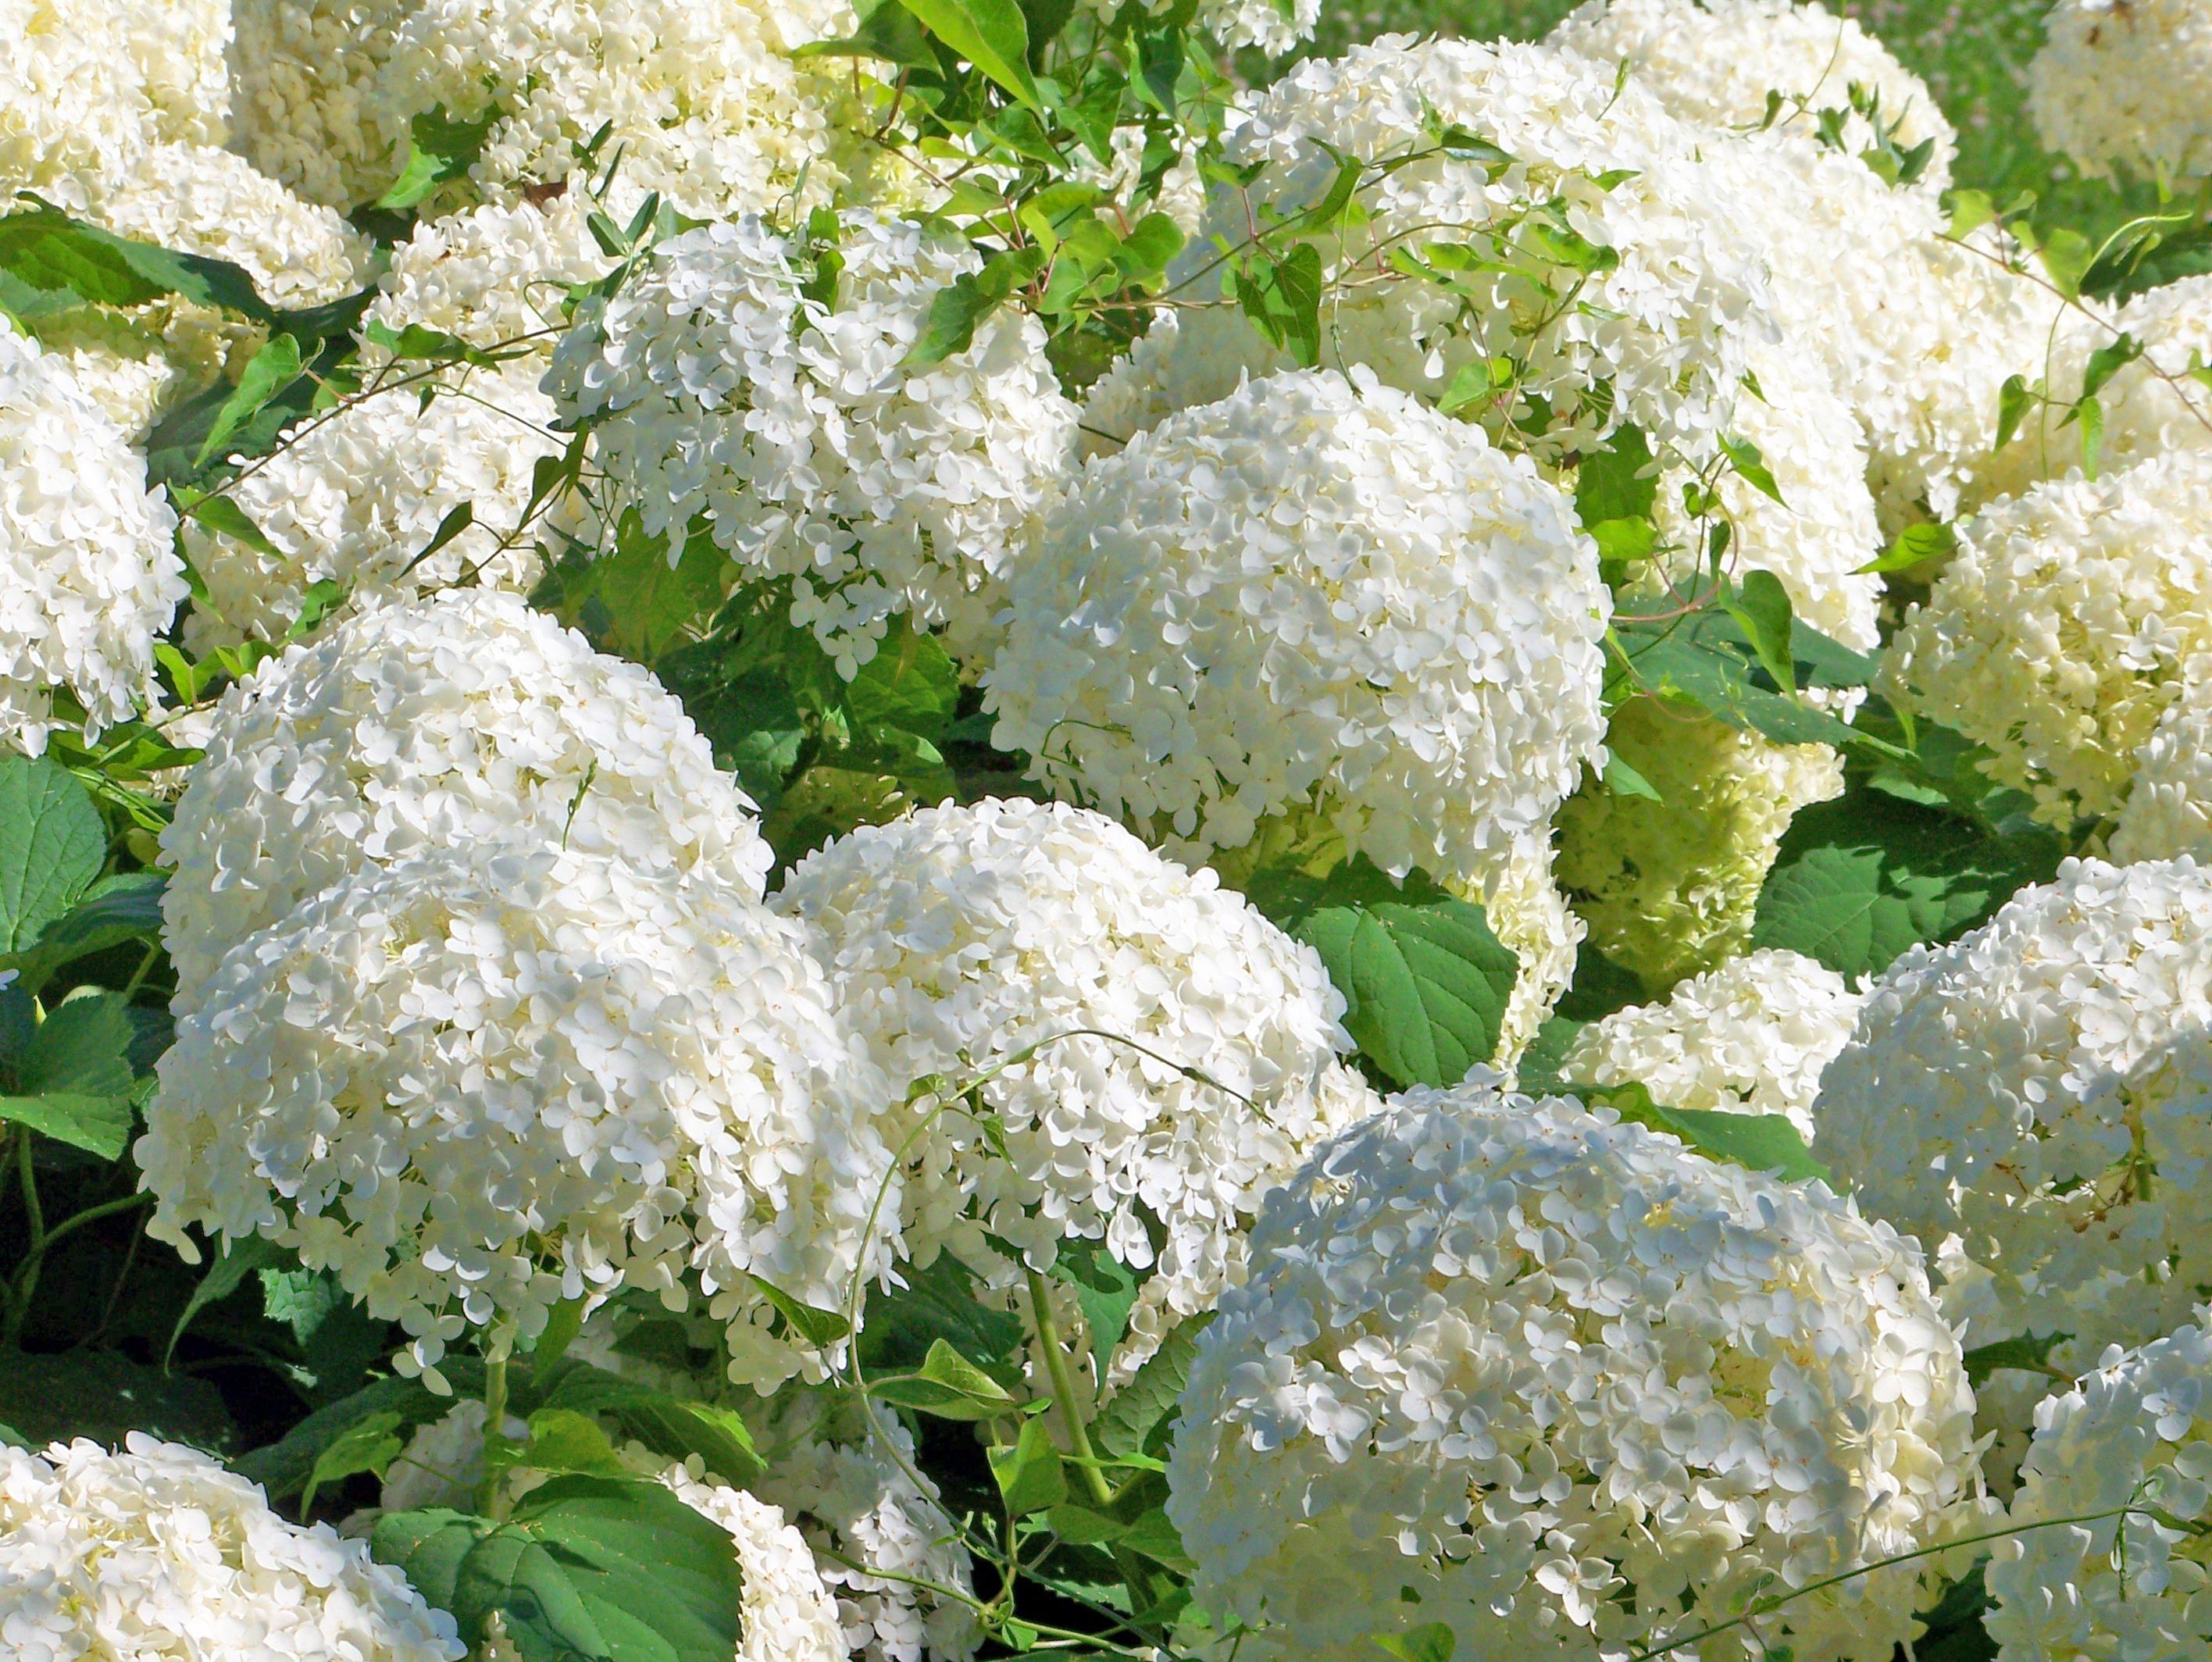 Free Images Blossom White Flower Floral Bush